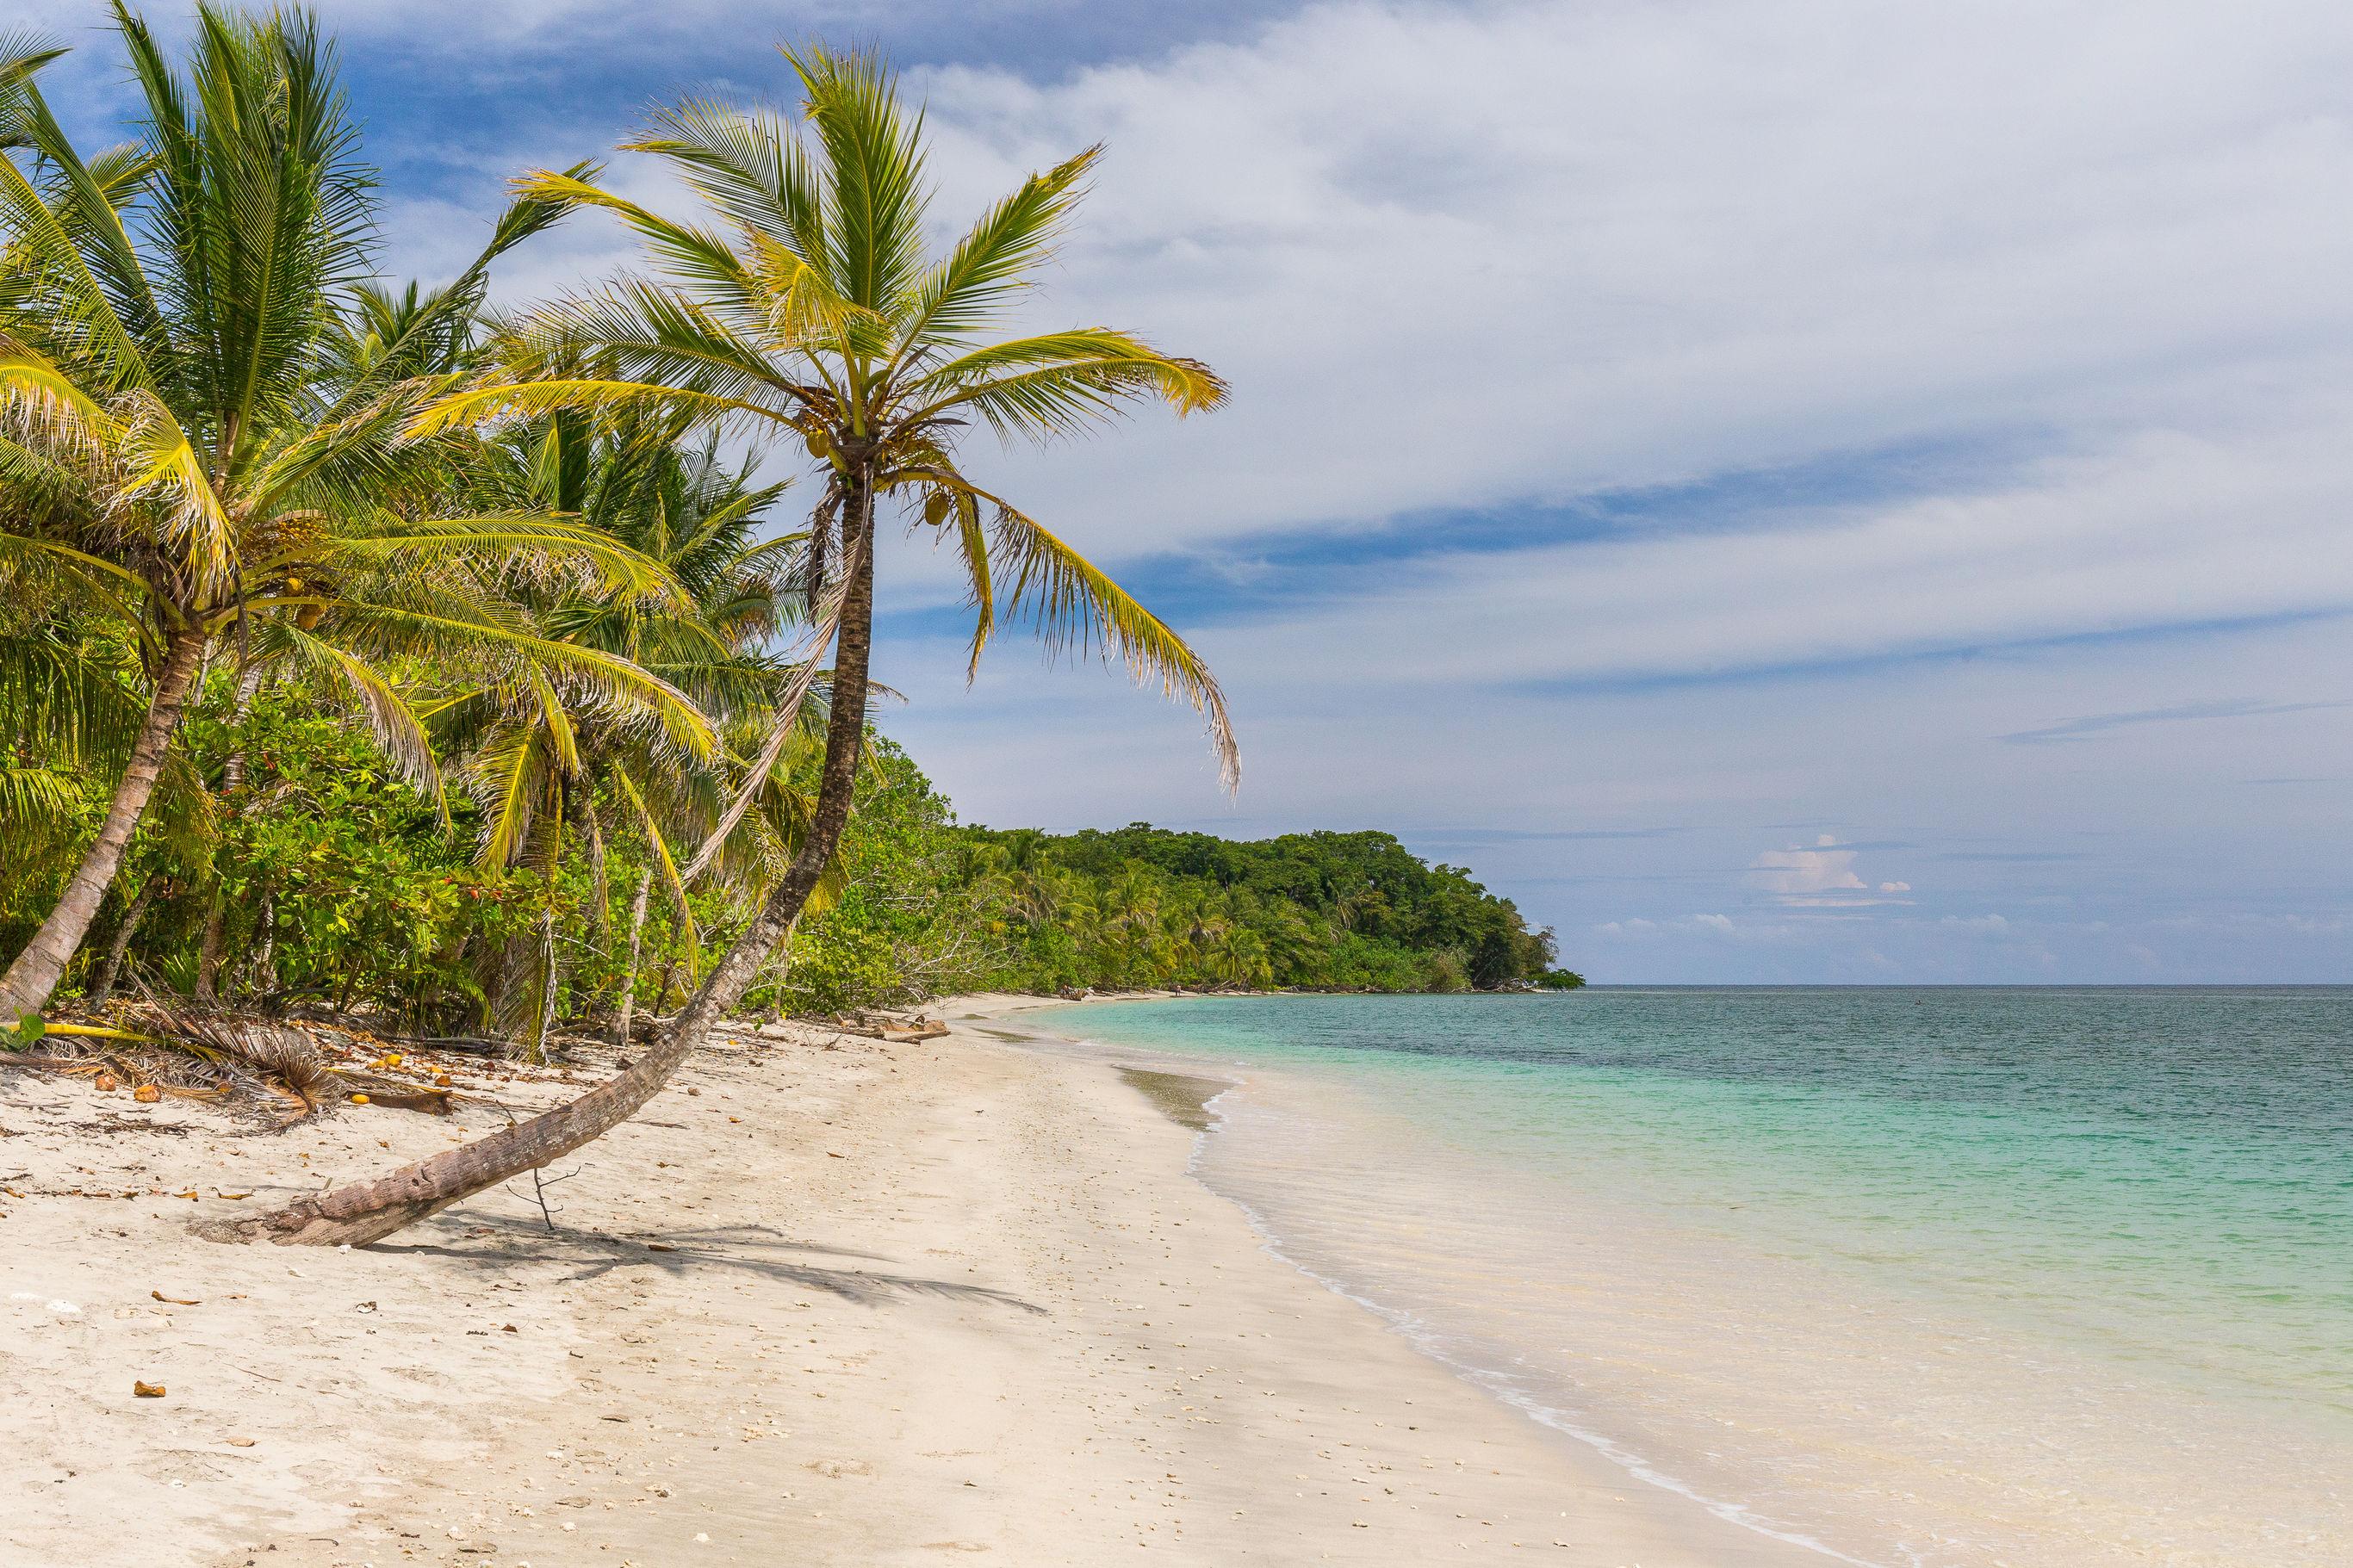 Cahuita-strand-palmboom_2_344473 Toerisme Europa - Toerisme Europa